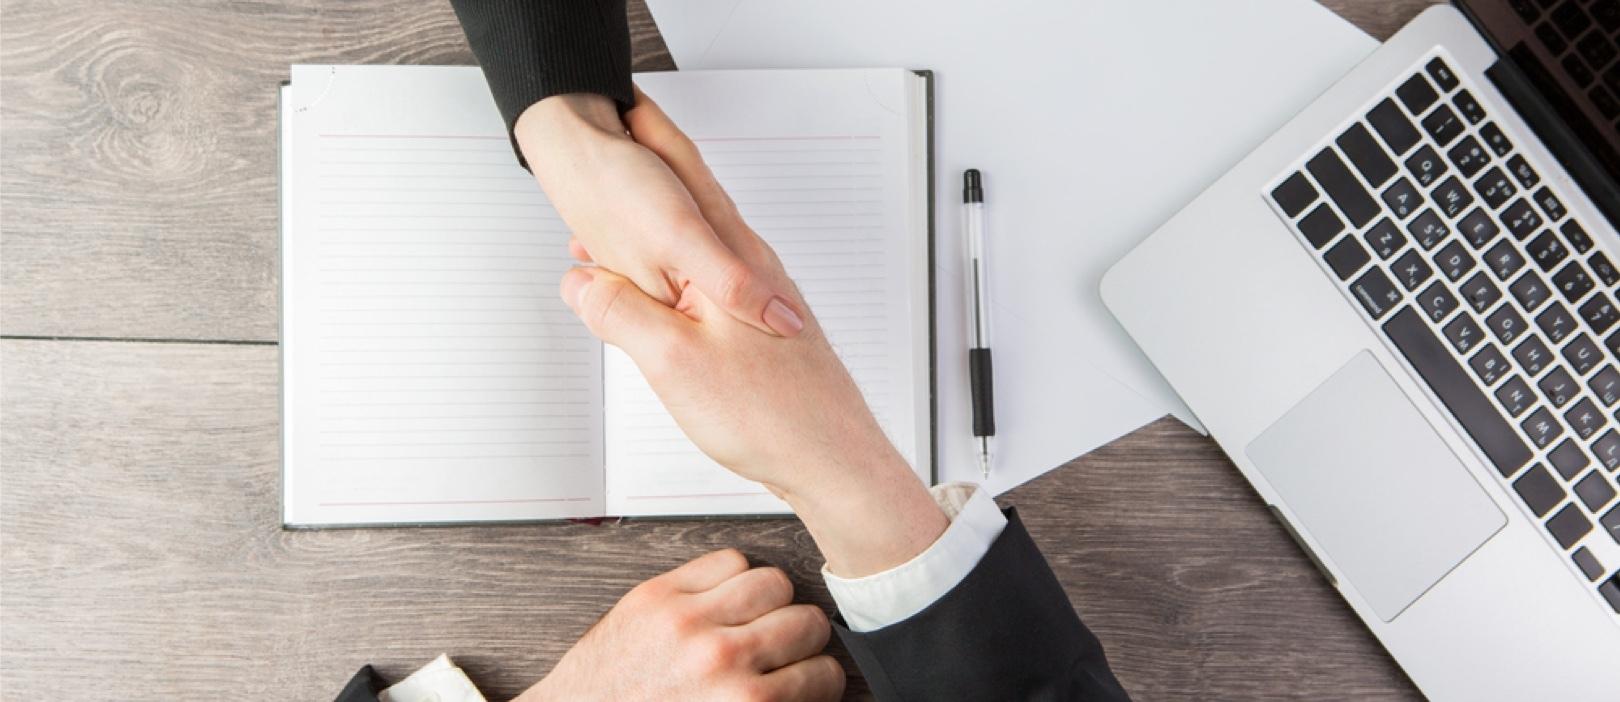 5 Keys to Building Customer Relationships in 2020